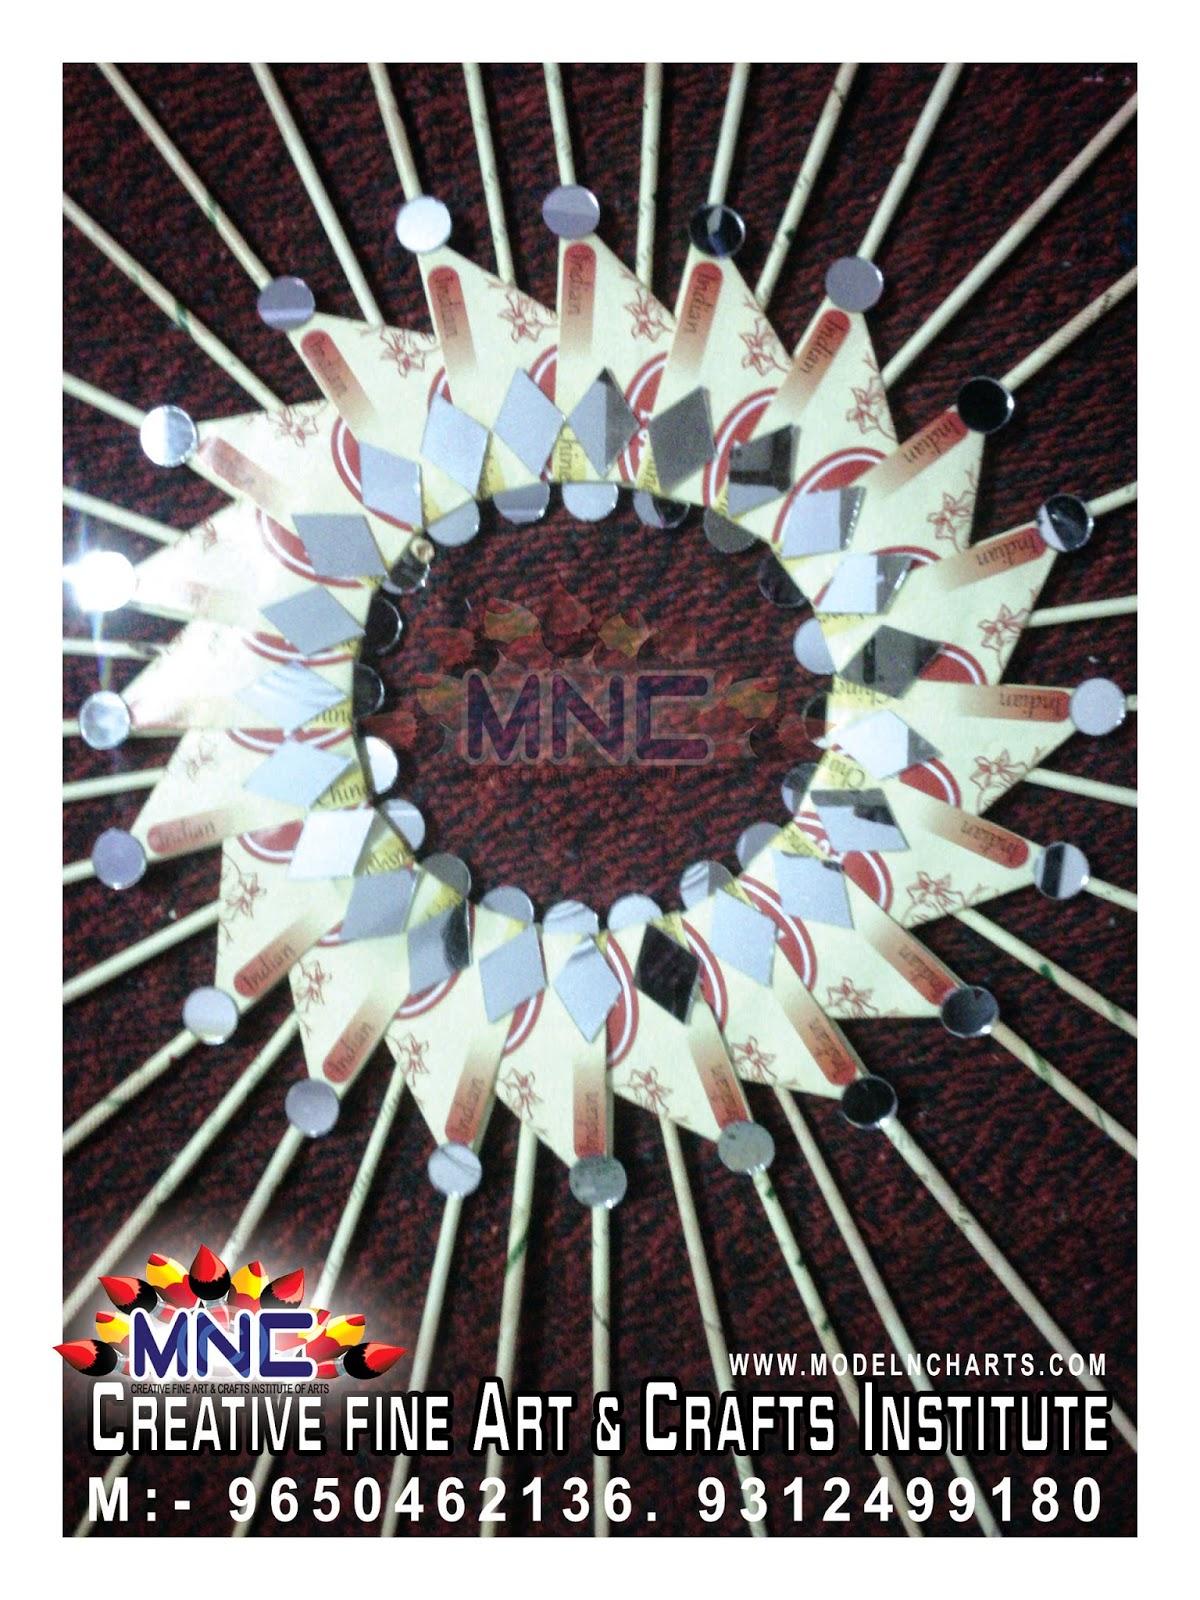 Creative fine art crafts institute 9650462136 home tutor in creative paper crafts courses paper craft institute in delhi ncr jeuxipadfo Choice Image